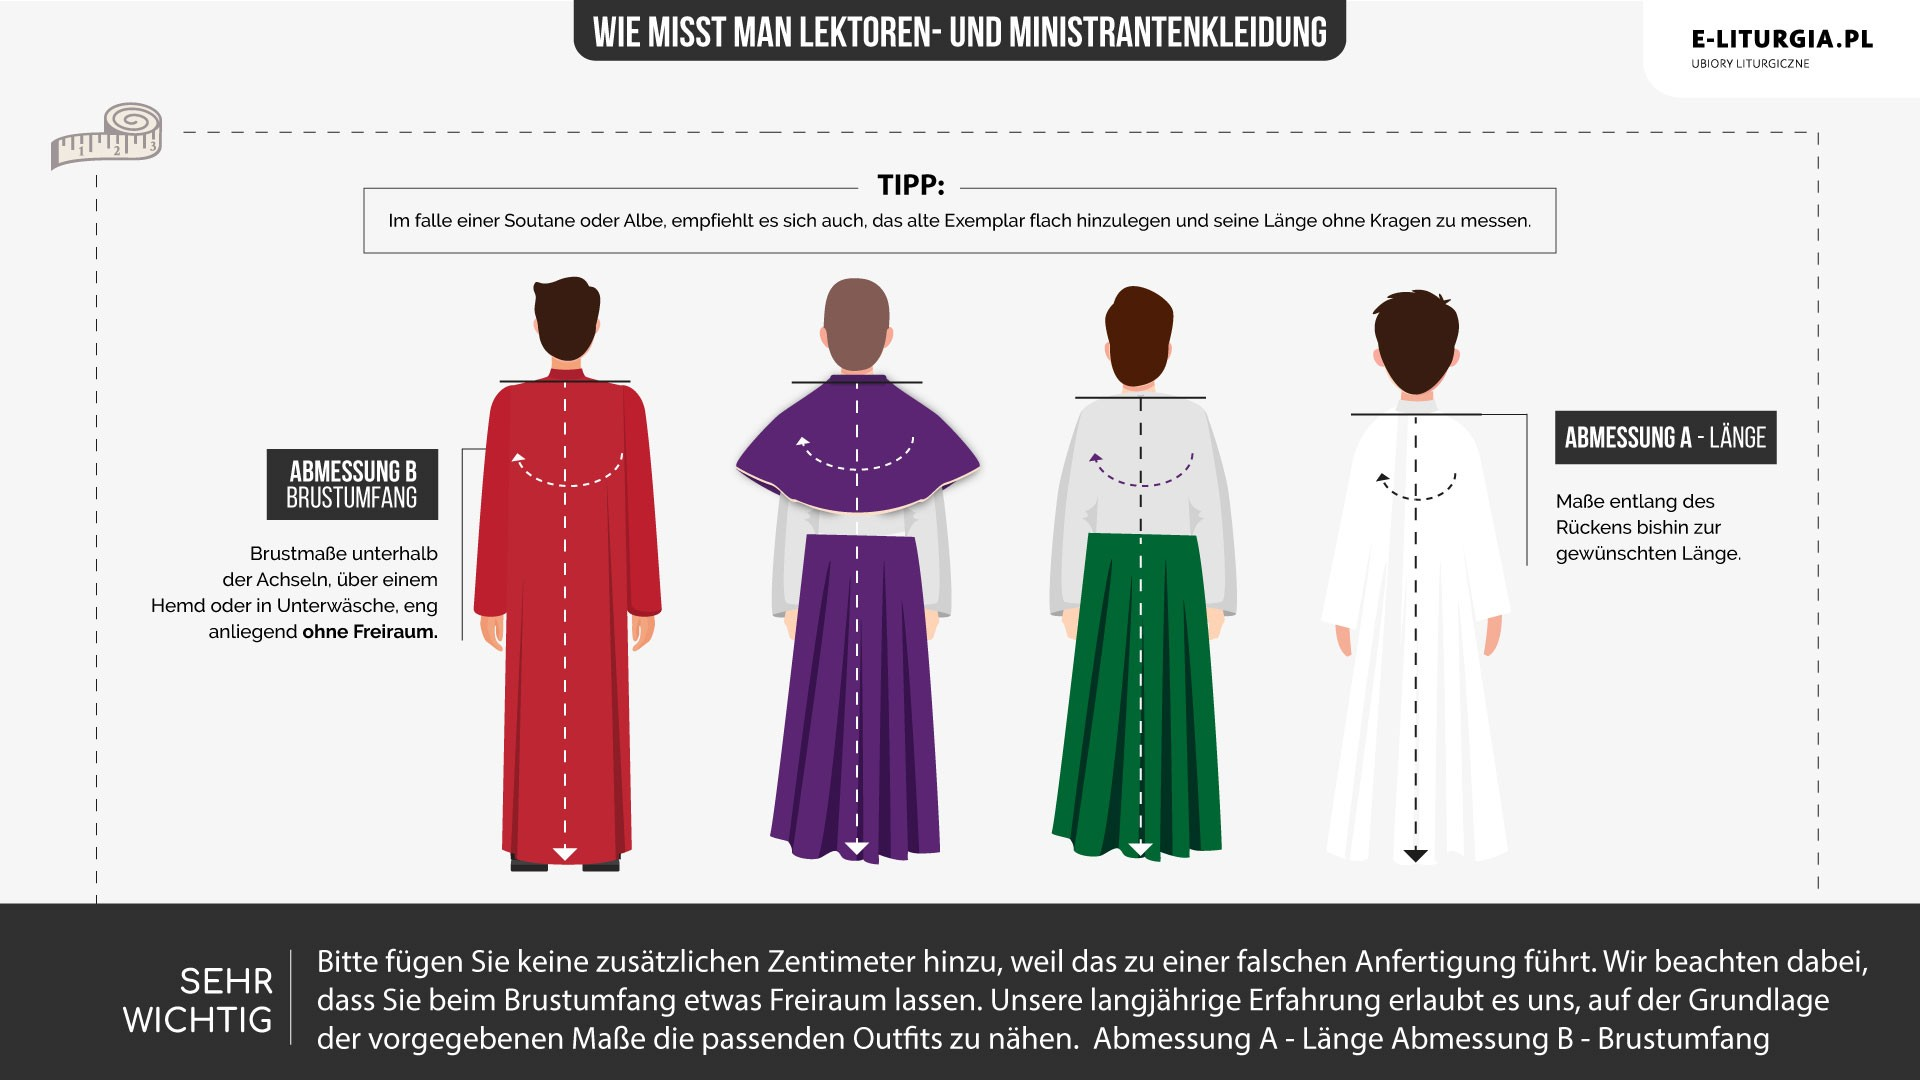 Lektorzy i ministranci (spódnice)